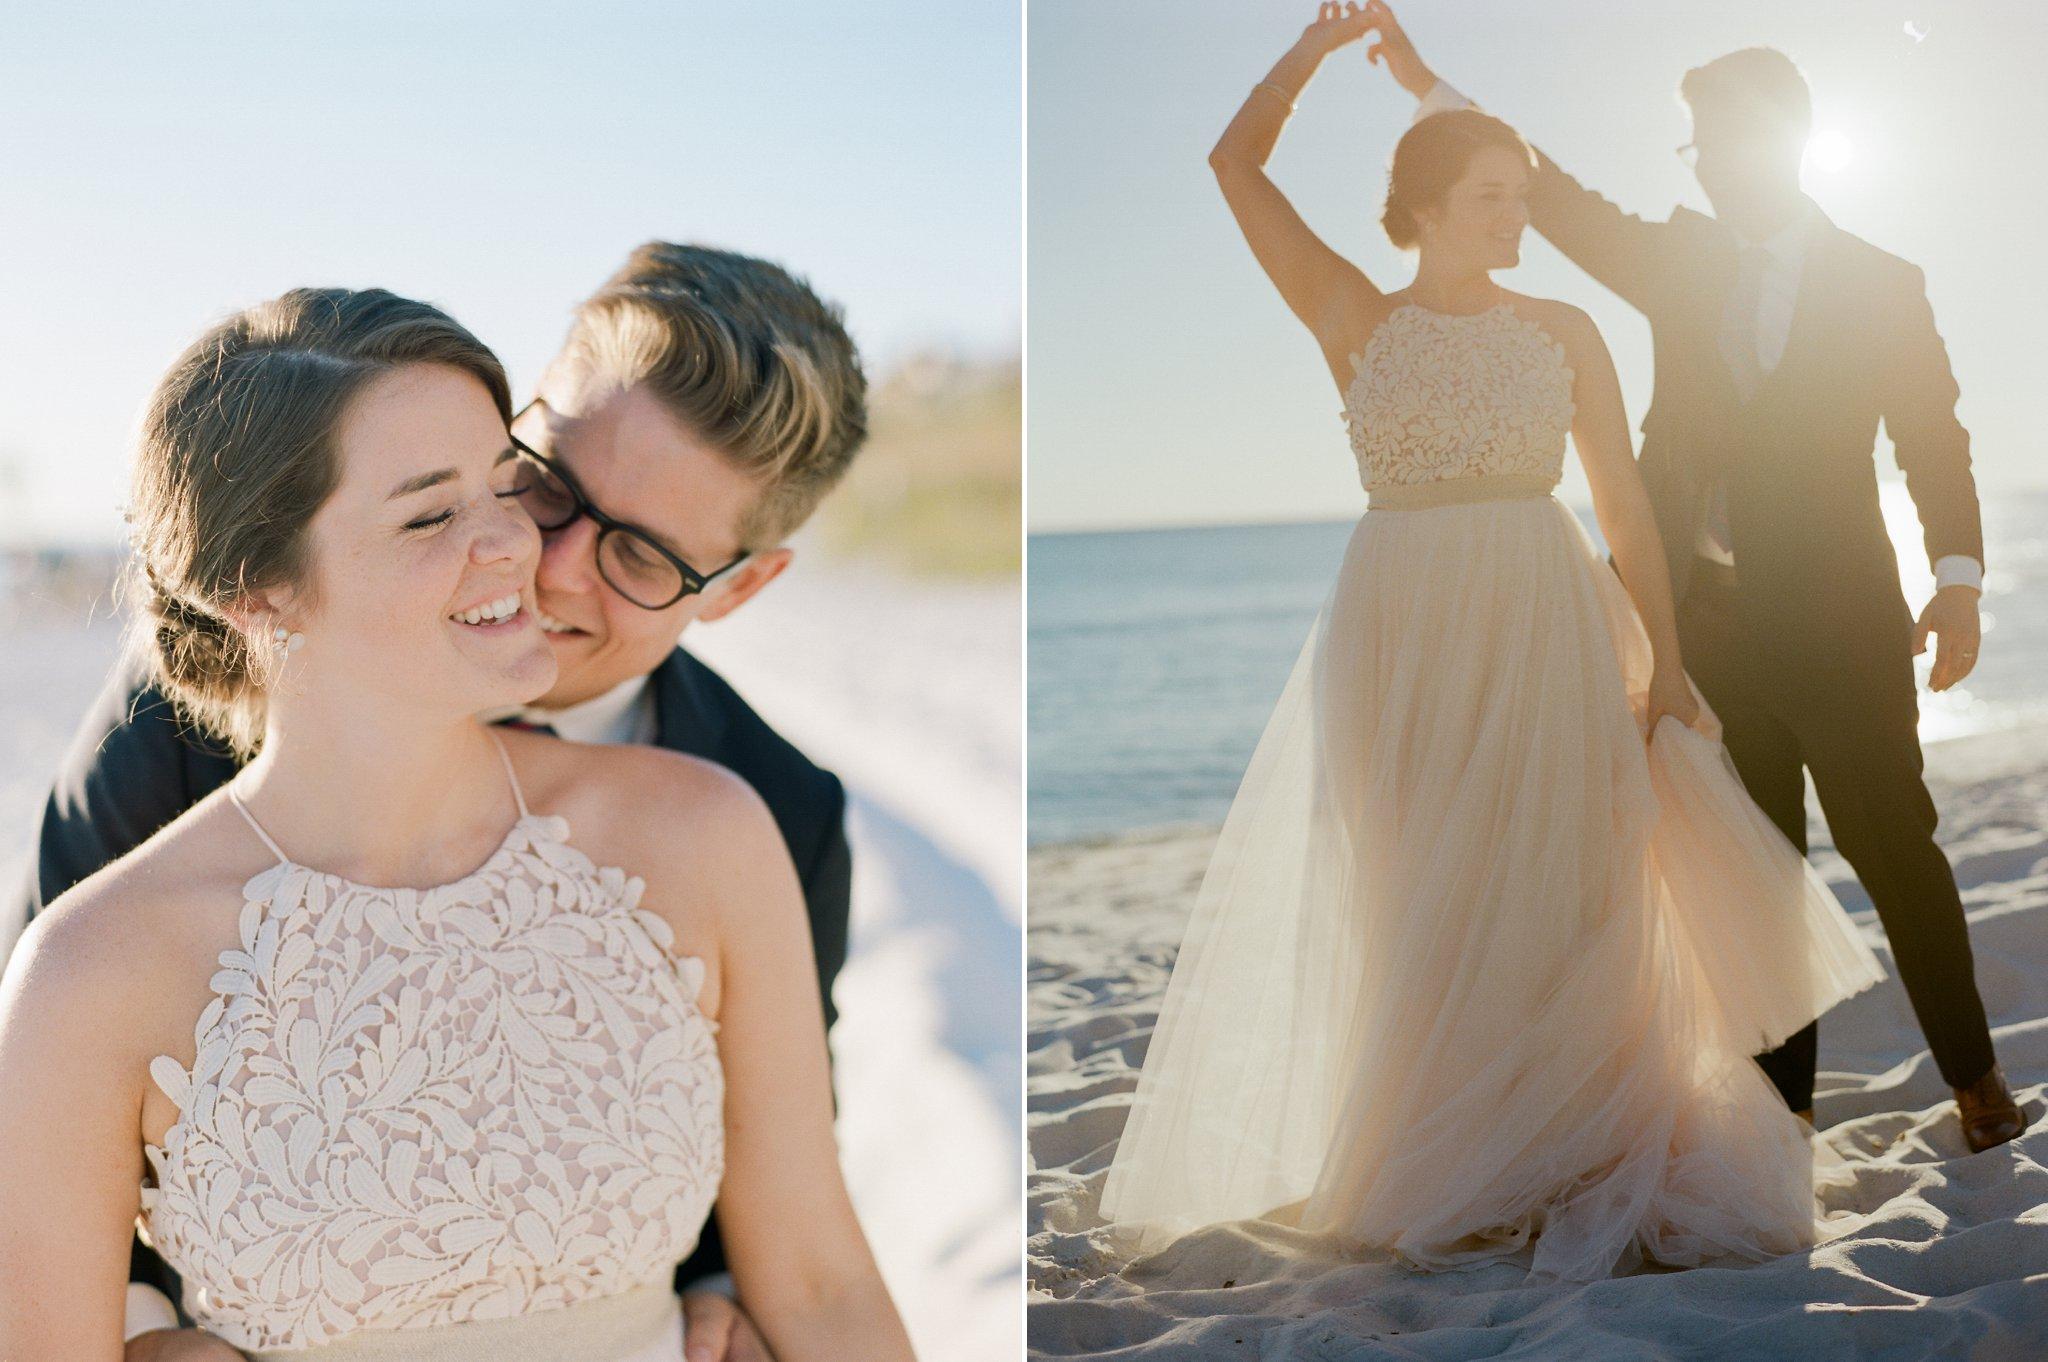 inlet beach wedding 30a wedding inlet beach wedding photographer shannon griffin photography_0018.jpg